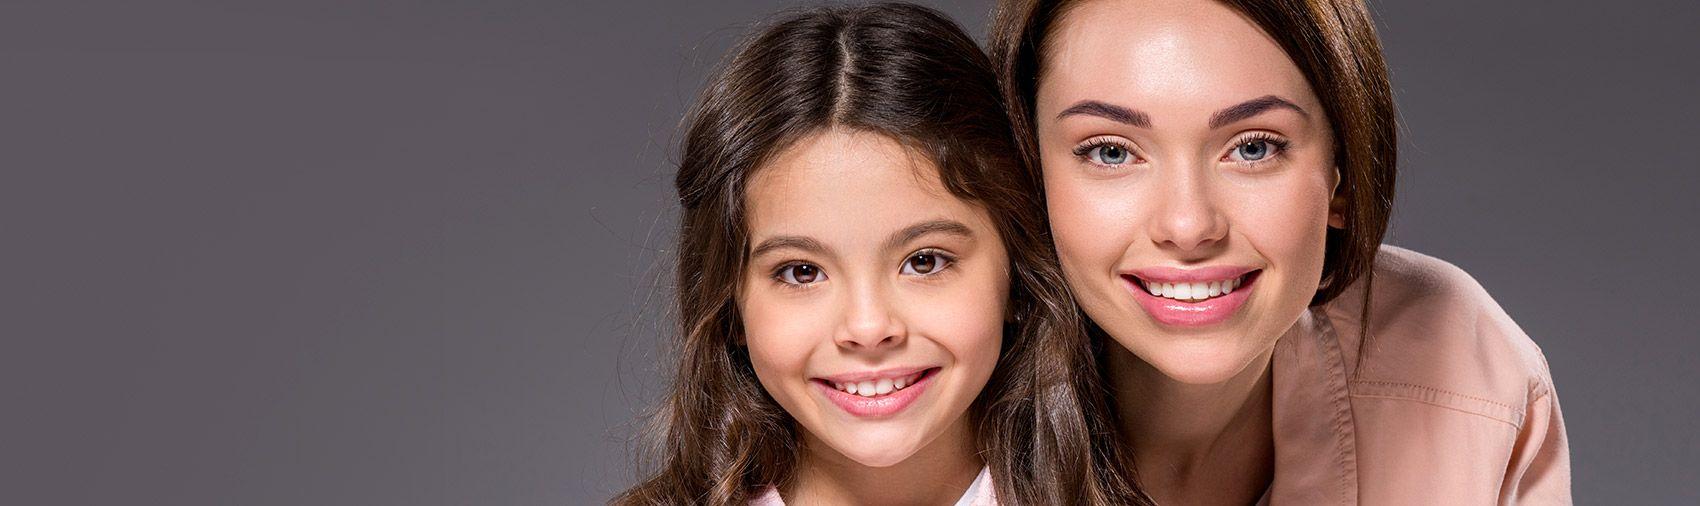 Dental Bonding - Meredith Levine, DDS, Inc.